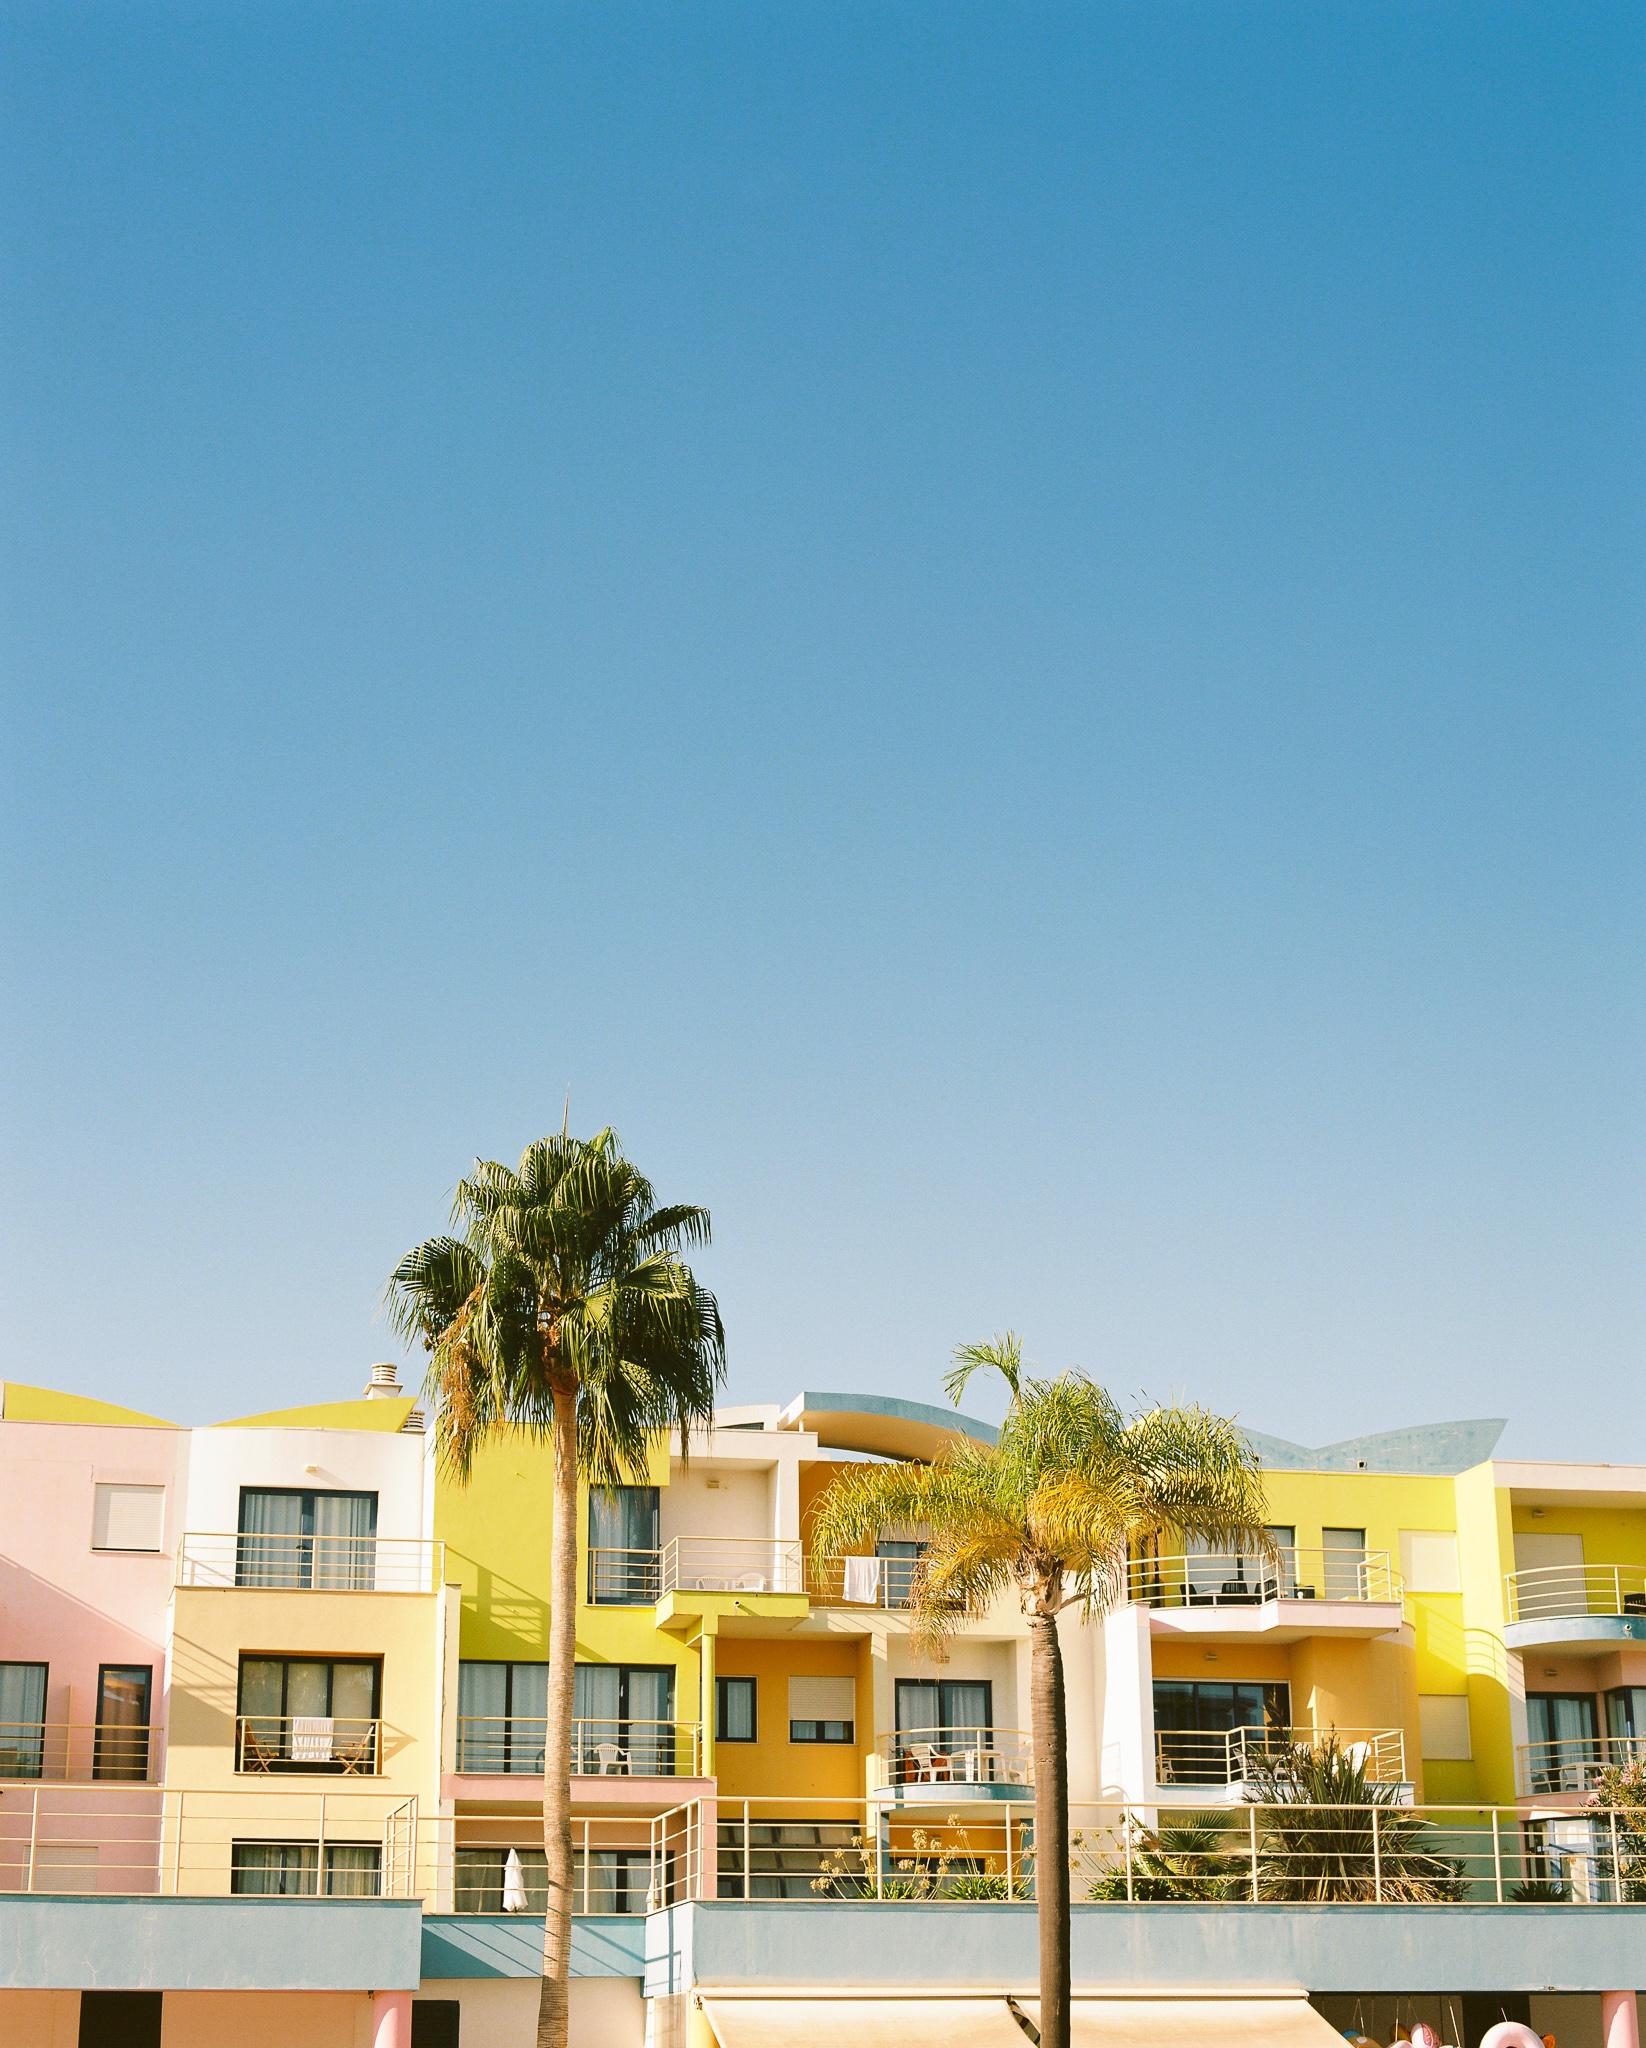 Algarve, Portugal. Pentax 67ii, Kodak Ektar 100